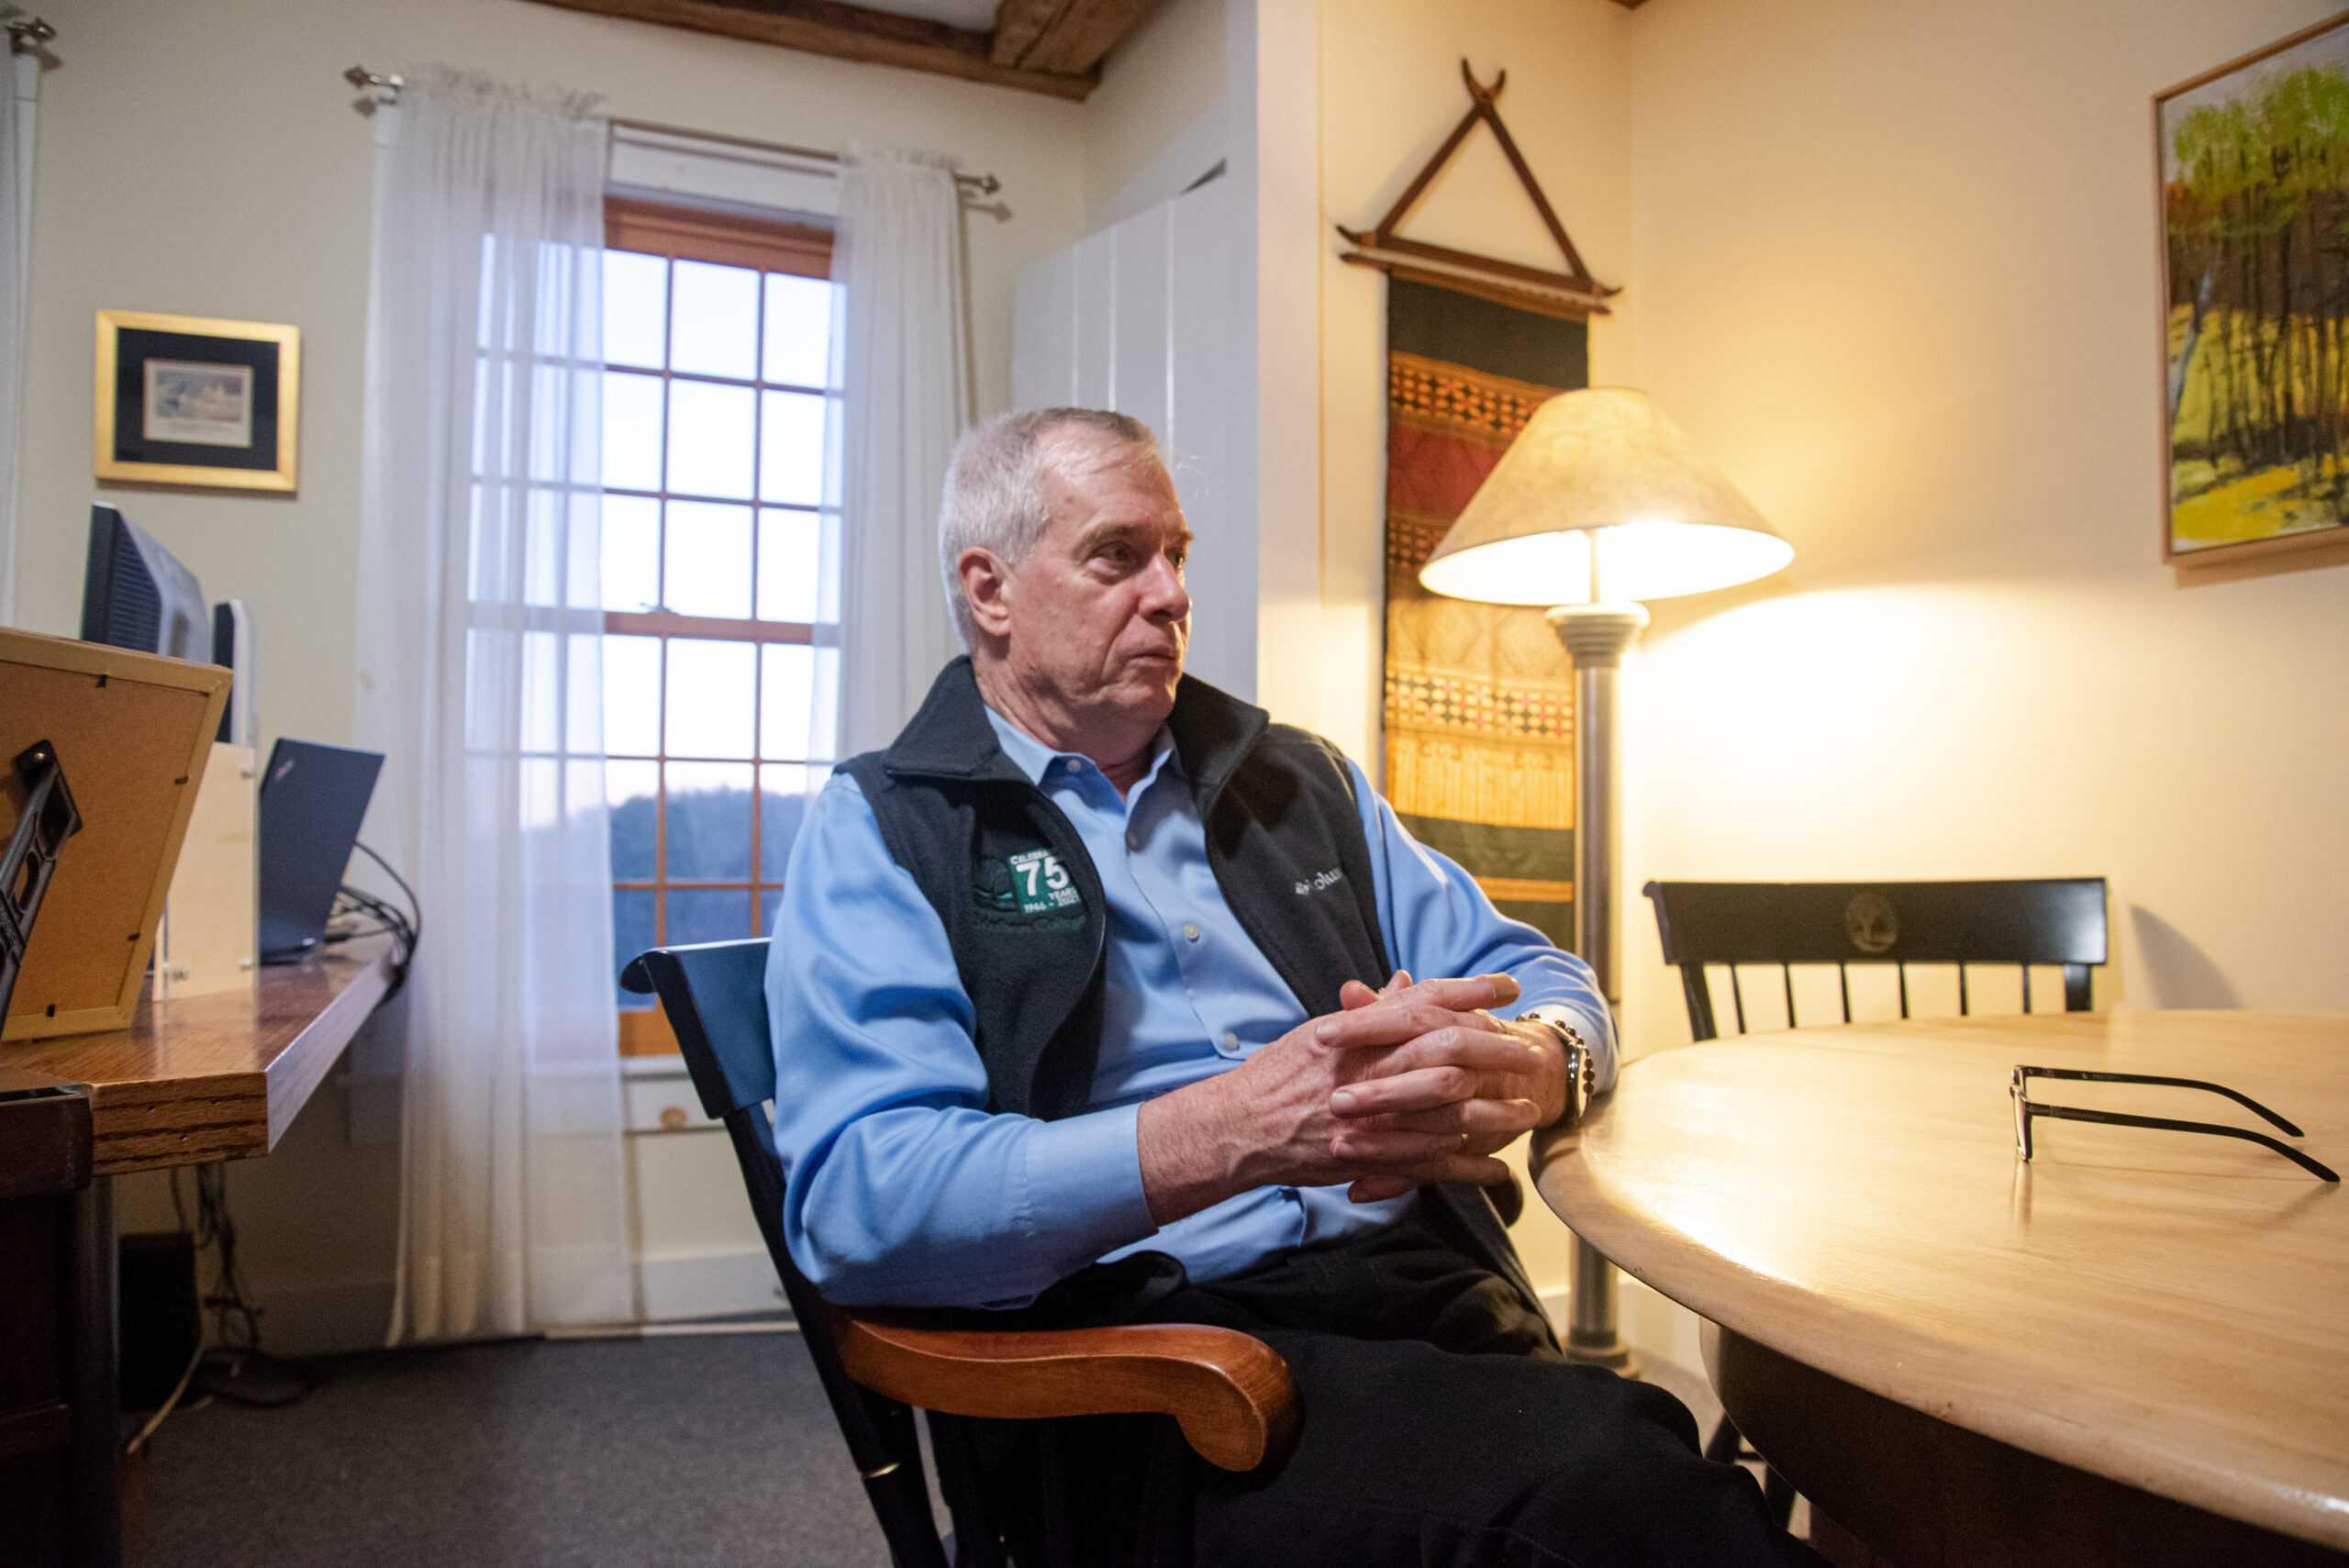 Marlboro College President Kevin Quigley sat down with The Beacon to discuss the Emerson-Marlboro merger. Jakob Menendez / Beacon Staff